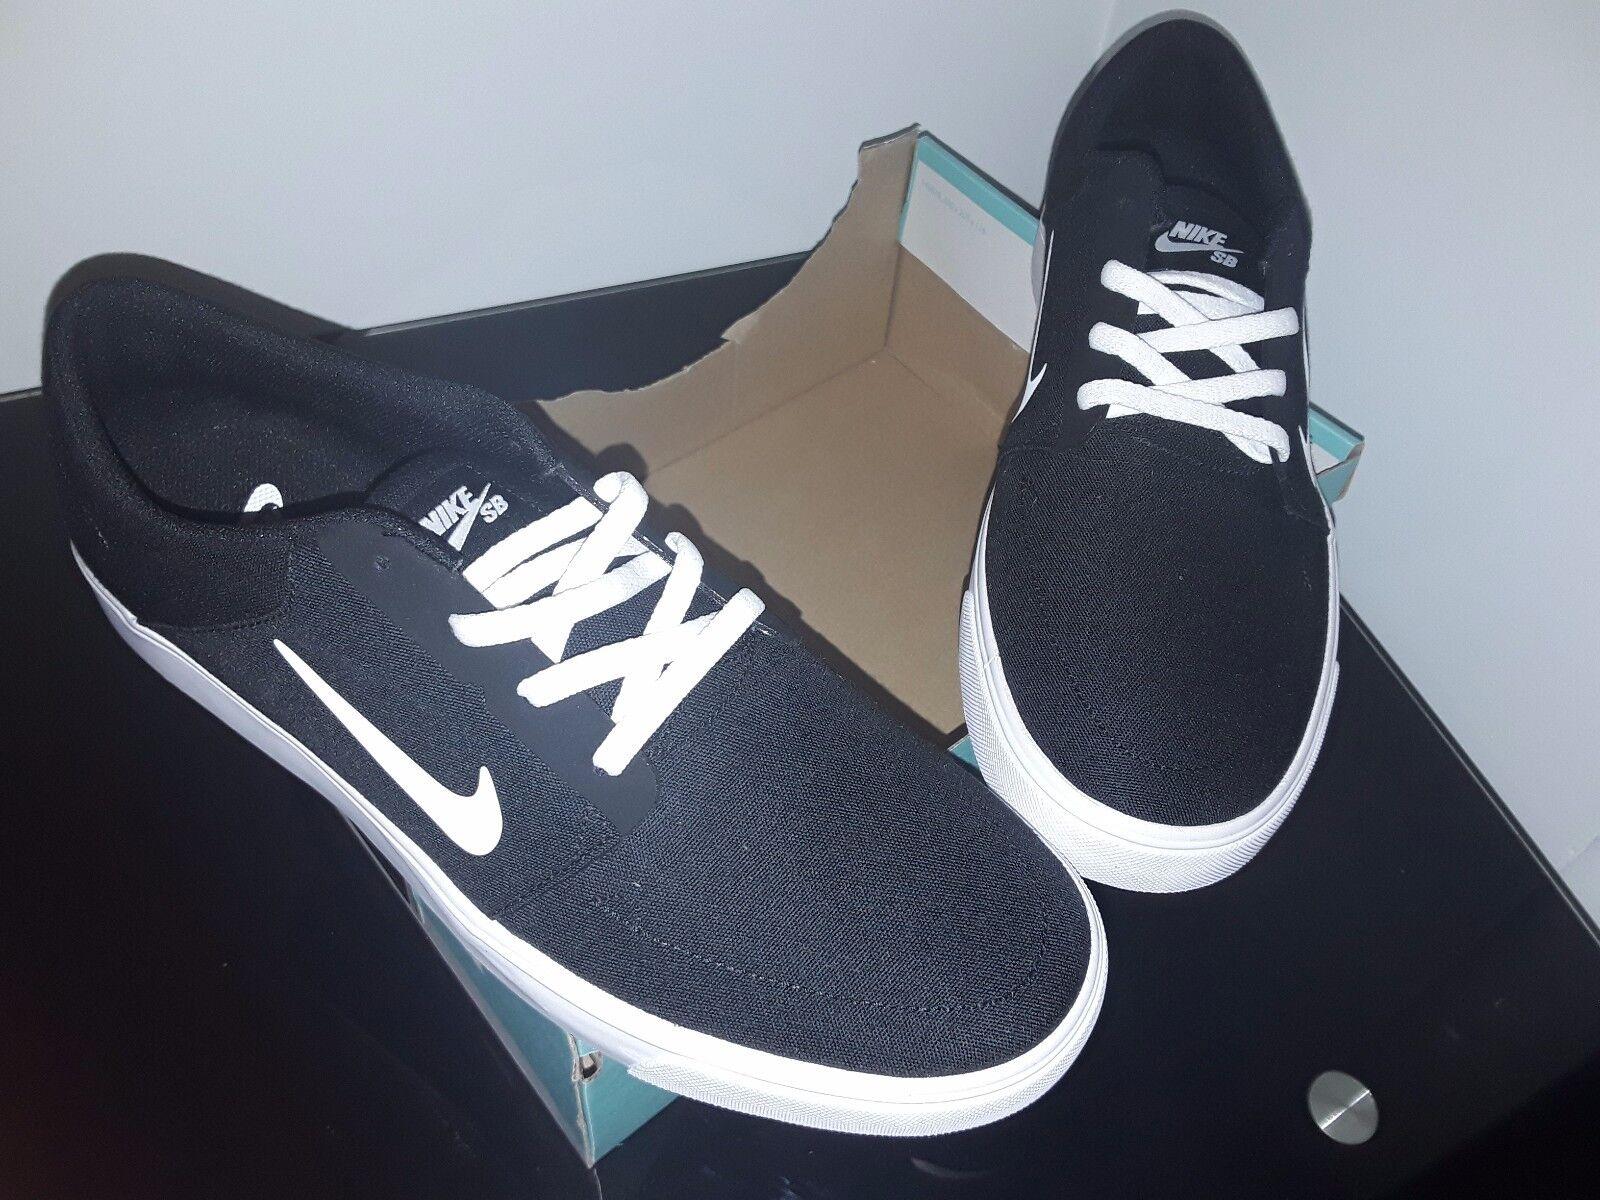 Nike SB 001 PORTMORE CNVS Zapatos  723874 001 SB nuevo para hombre e8d4a4